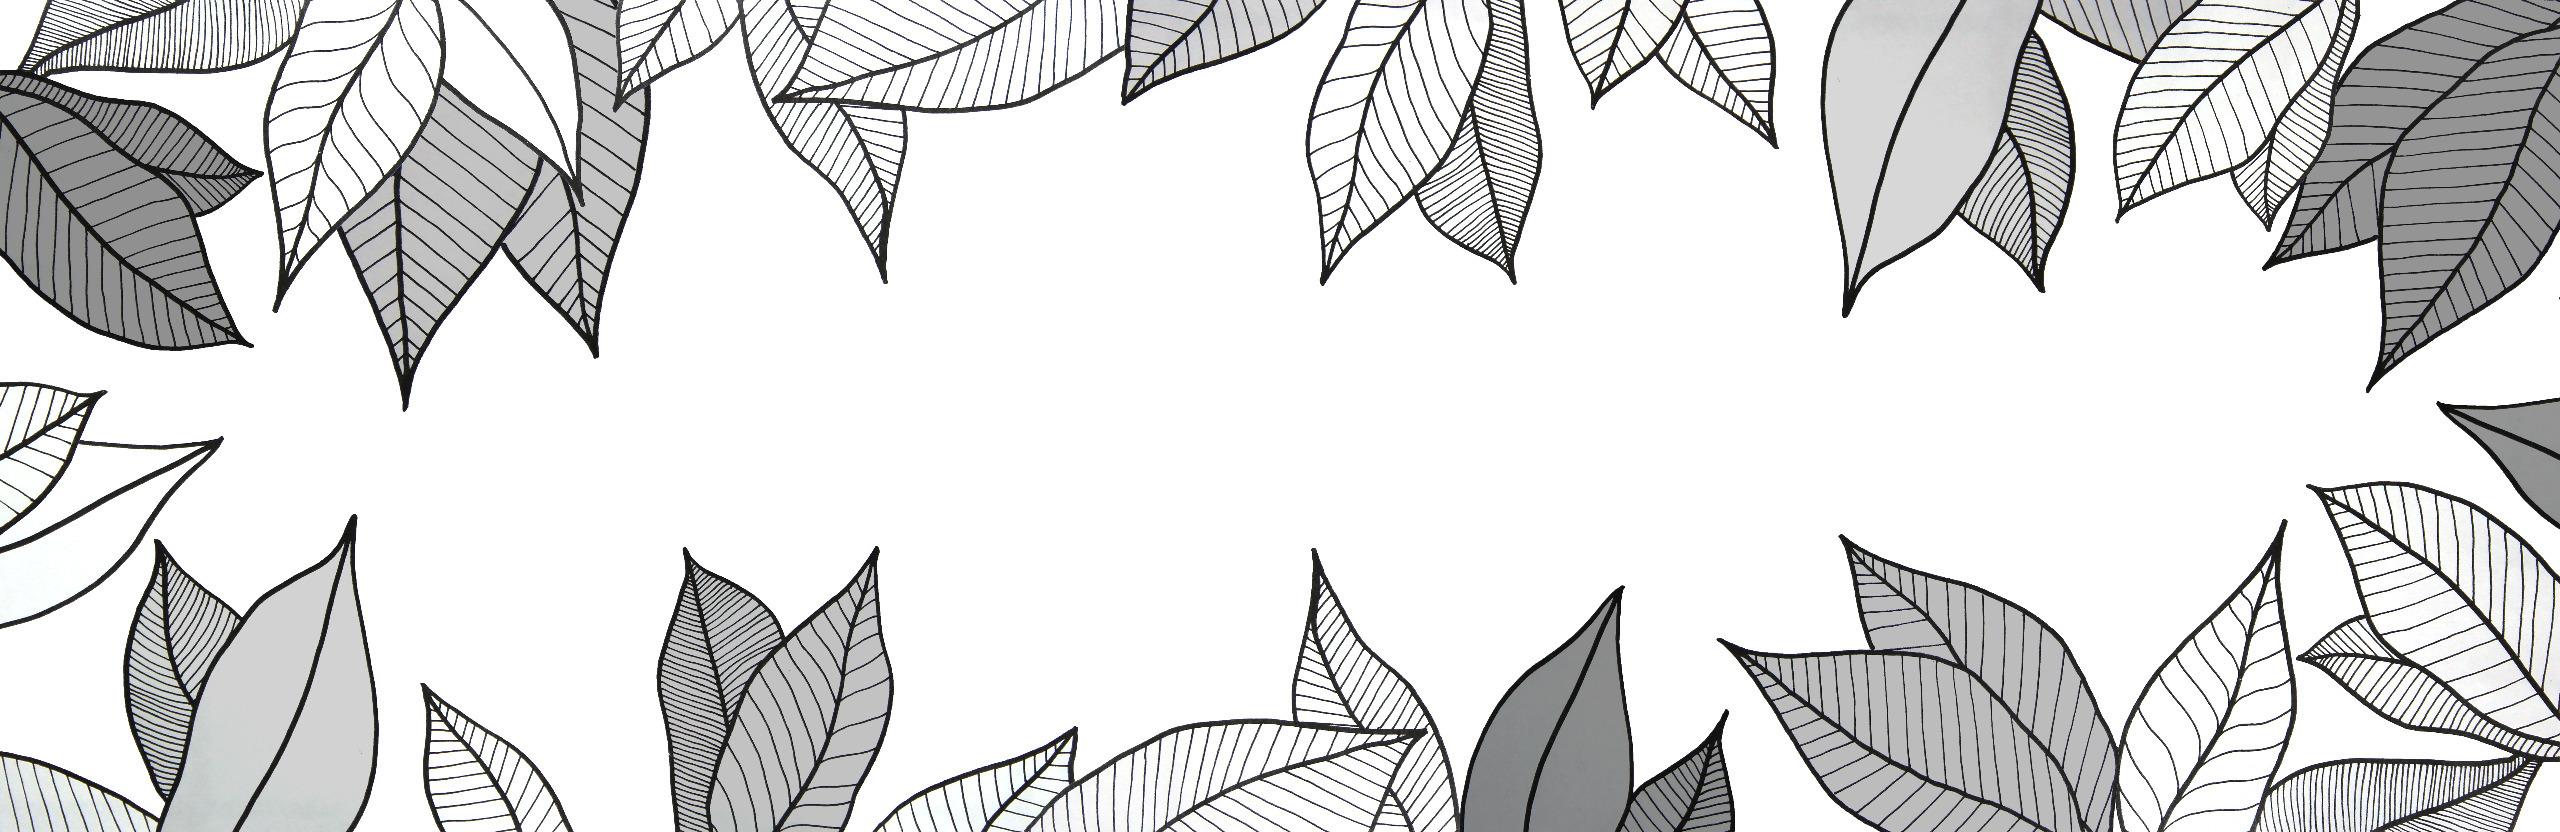 T E X T • B I L D • W E R K (@textbildwerk) Cover Image